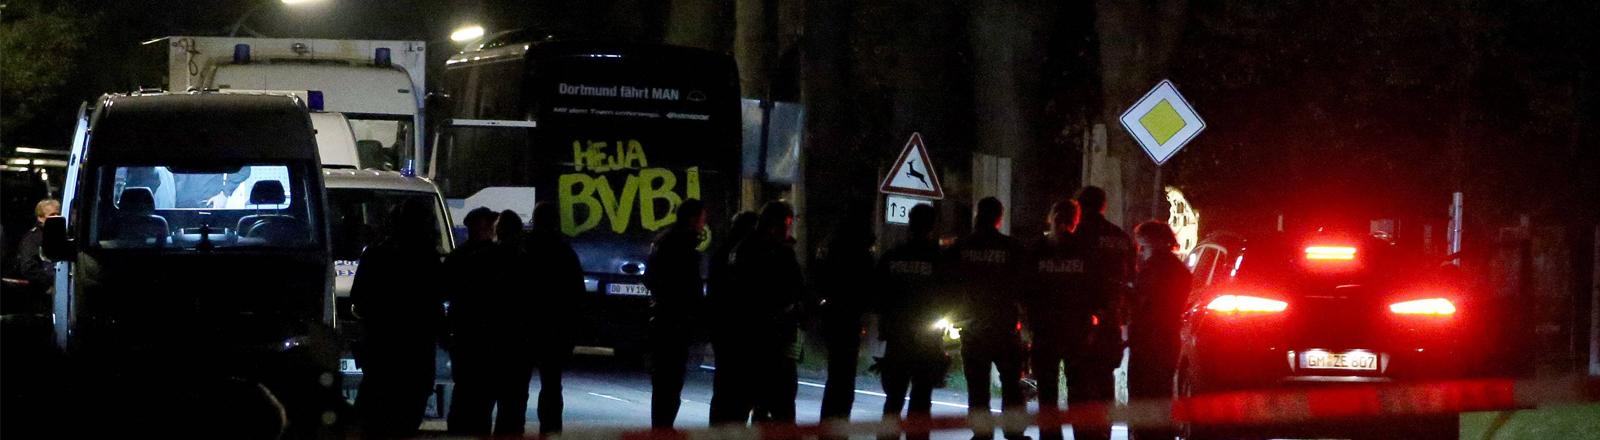 Der Bus des BVB nach dem Anschlag